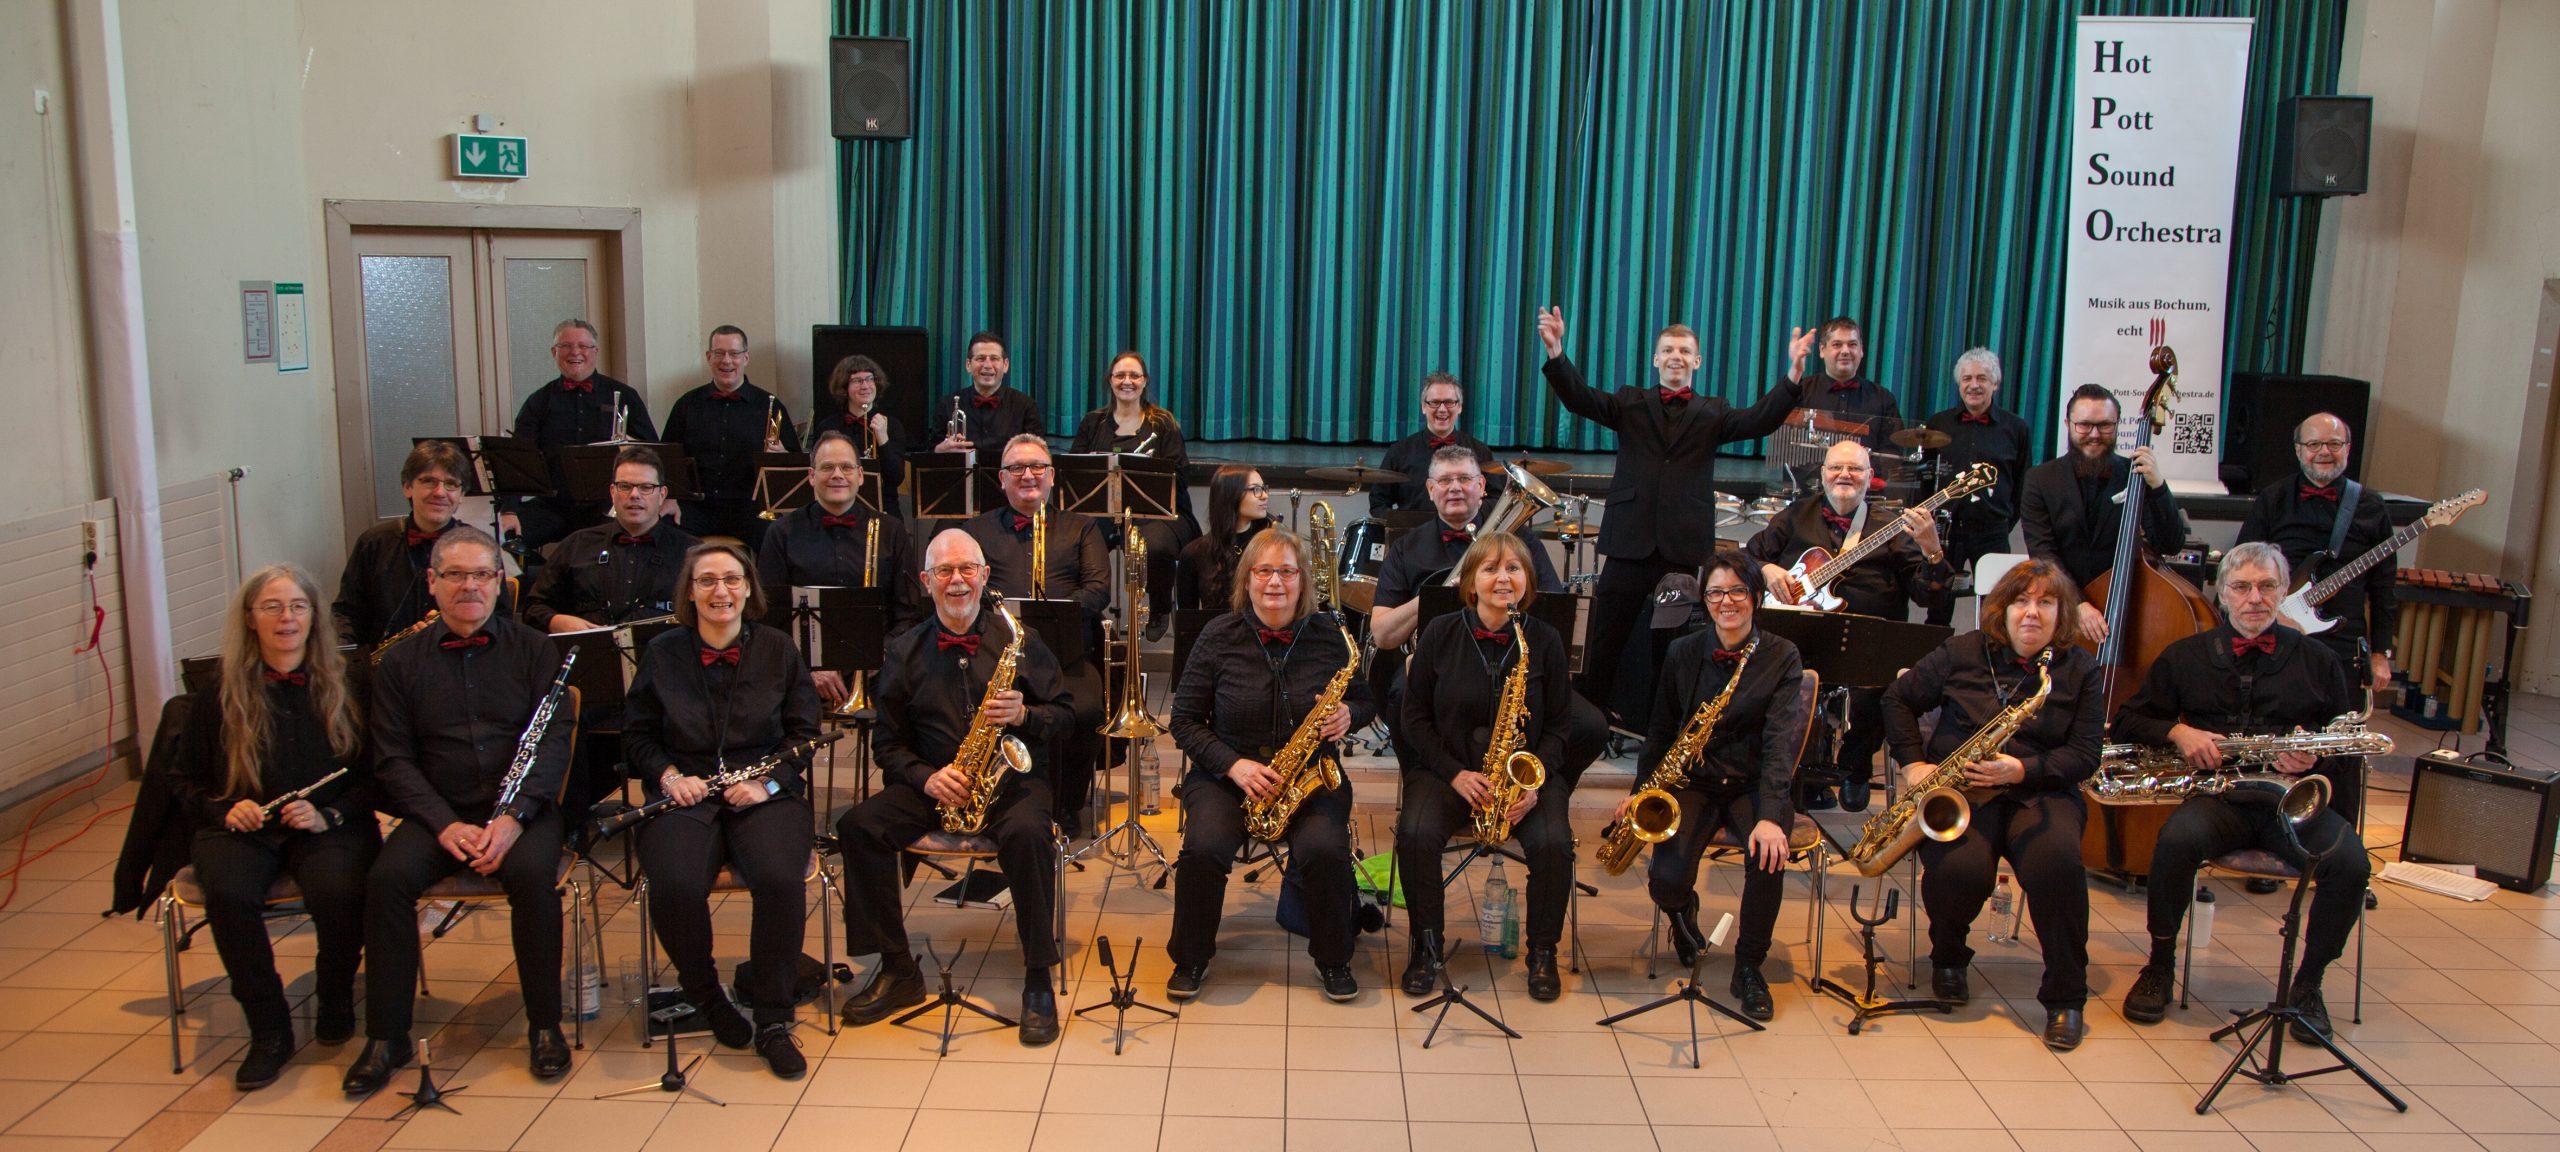 Hot Pott Sound Orchestra